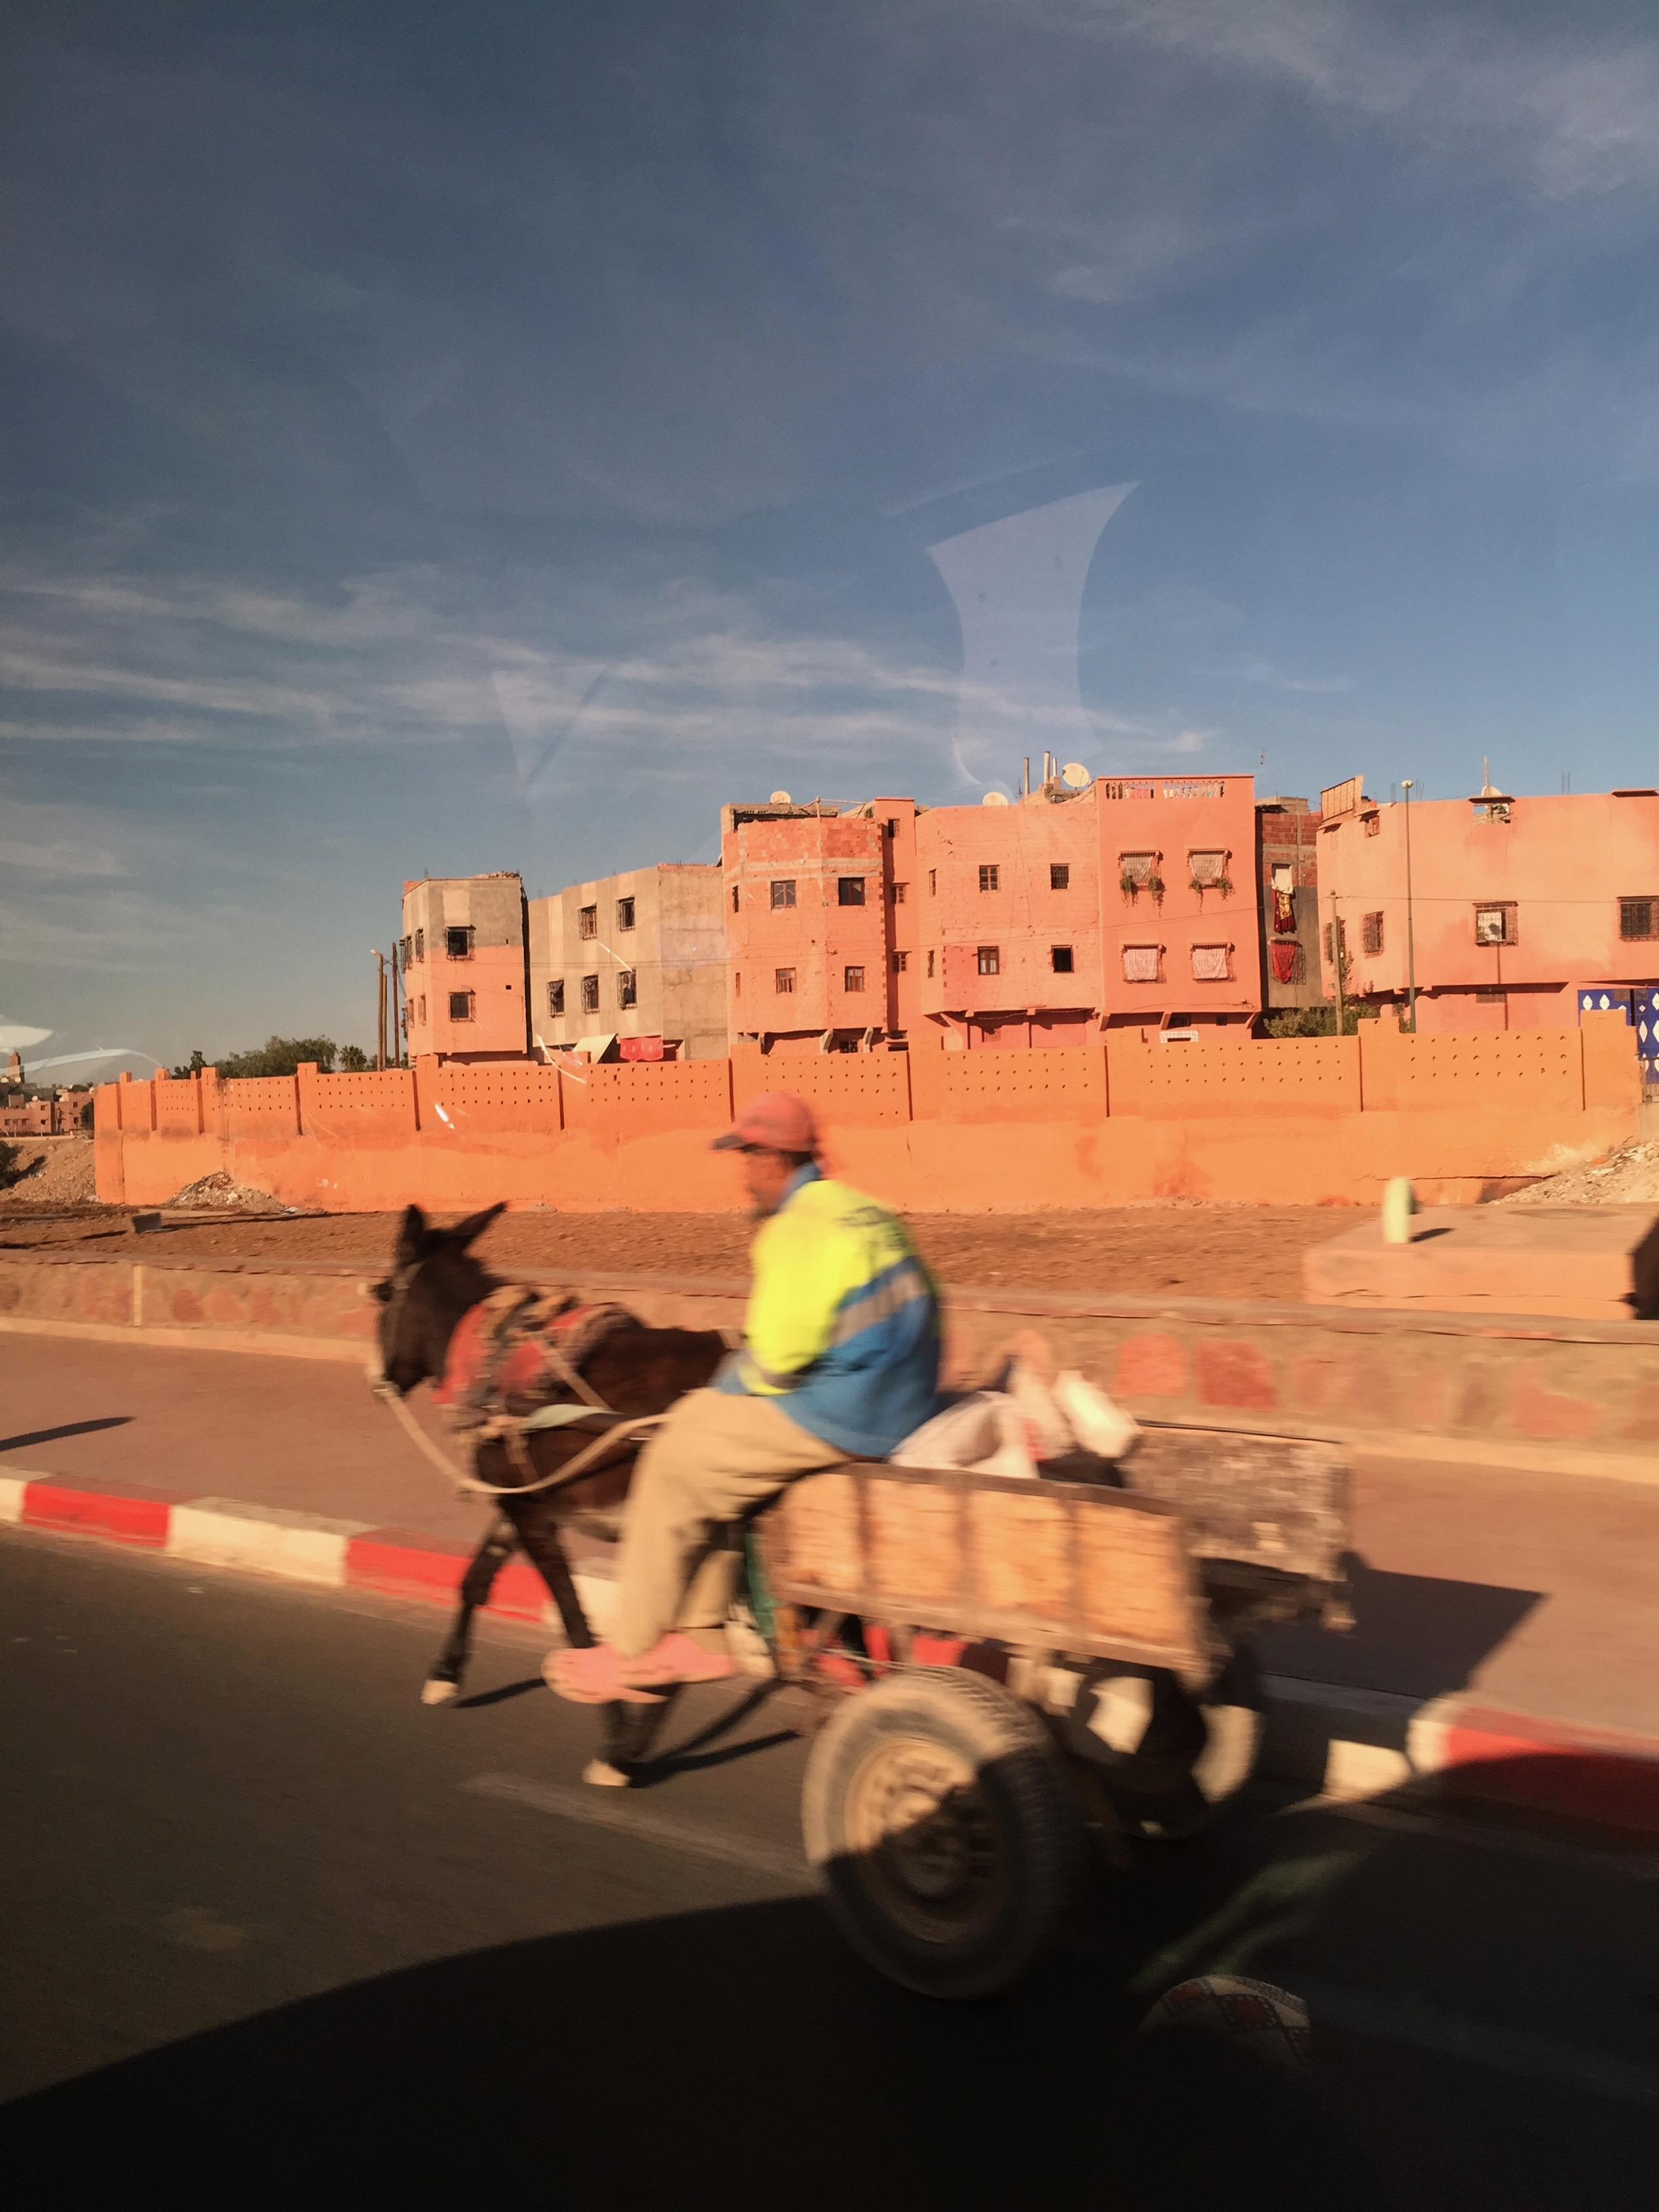 Dodging the traffic in Marrakech